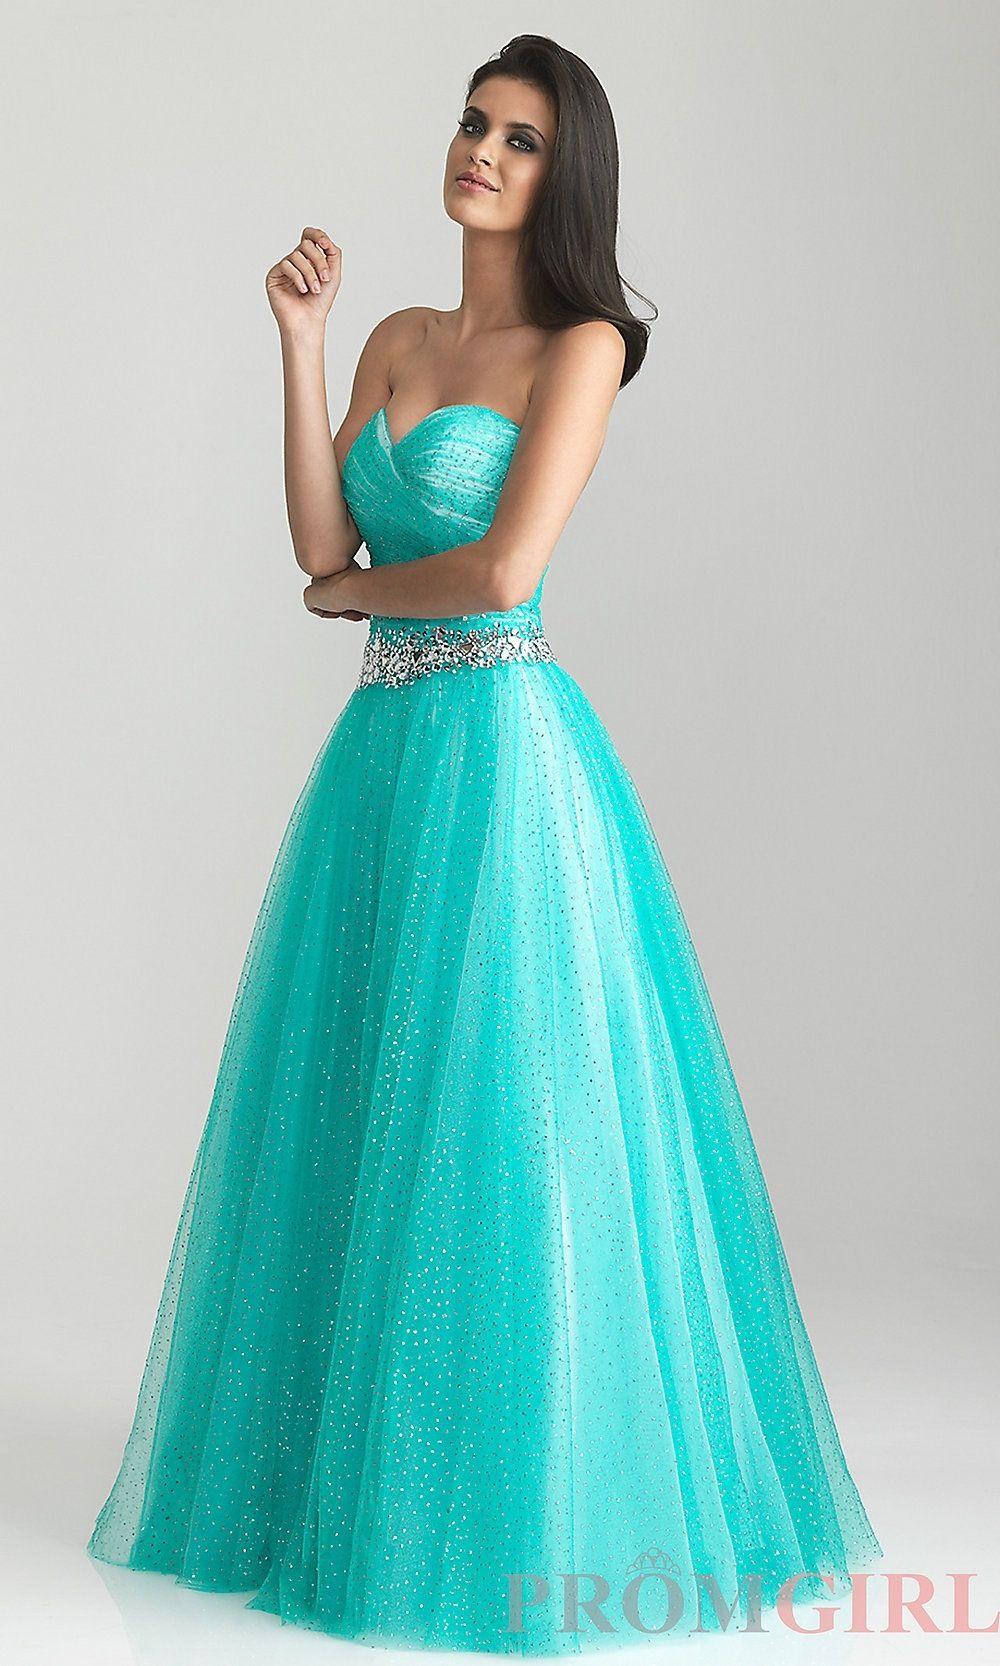 Pretty mint green sparkly dress | Dresses | Pinterest | Green ...